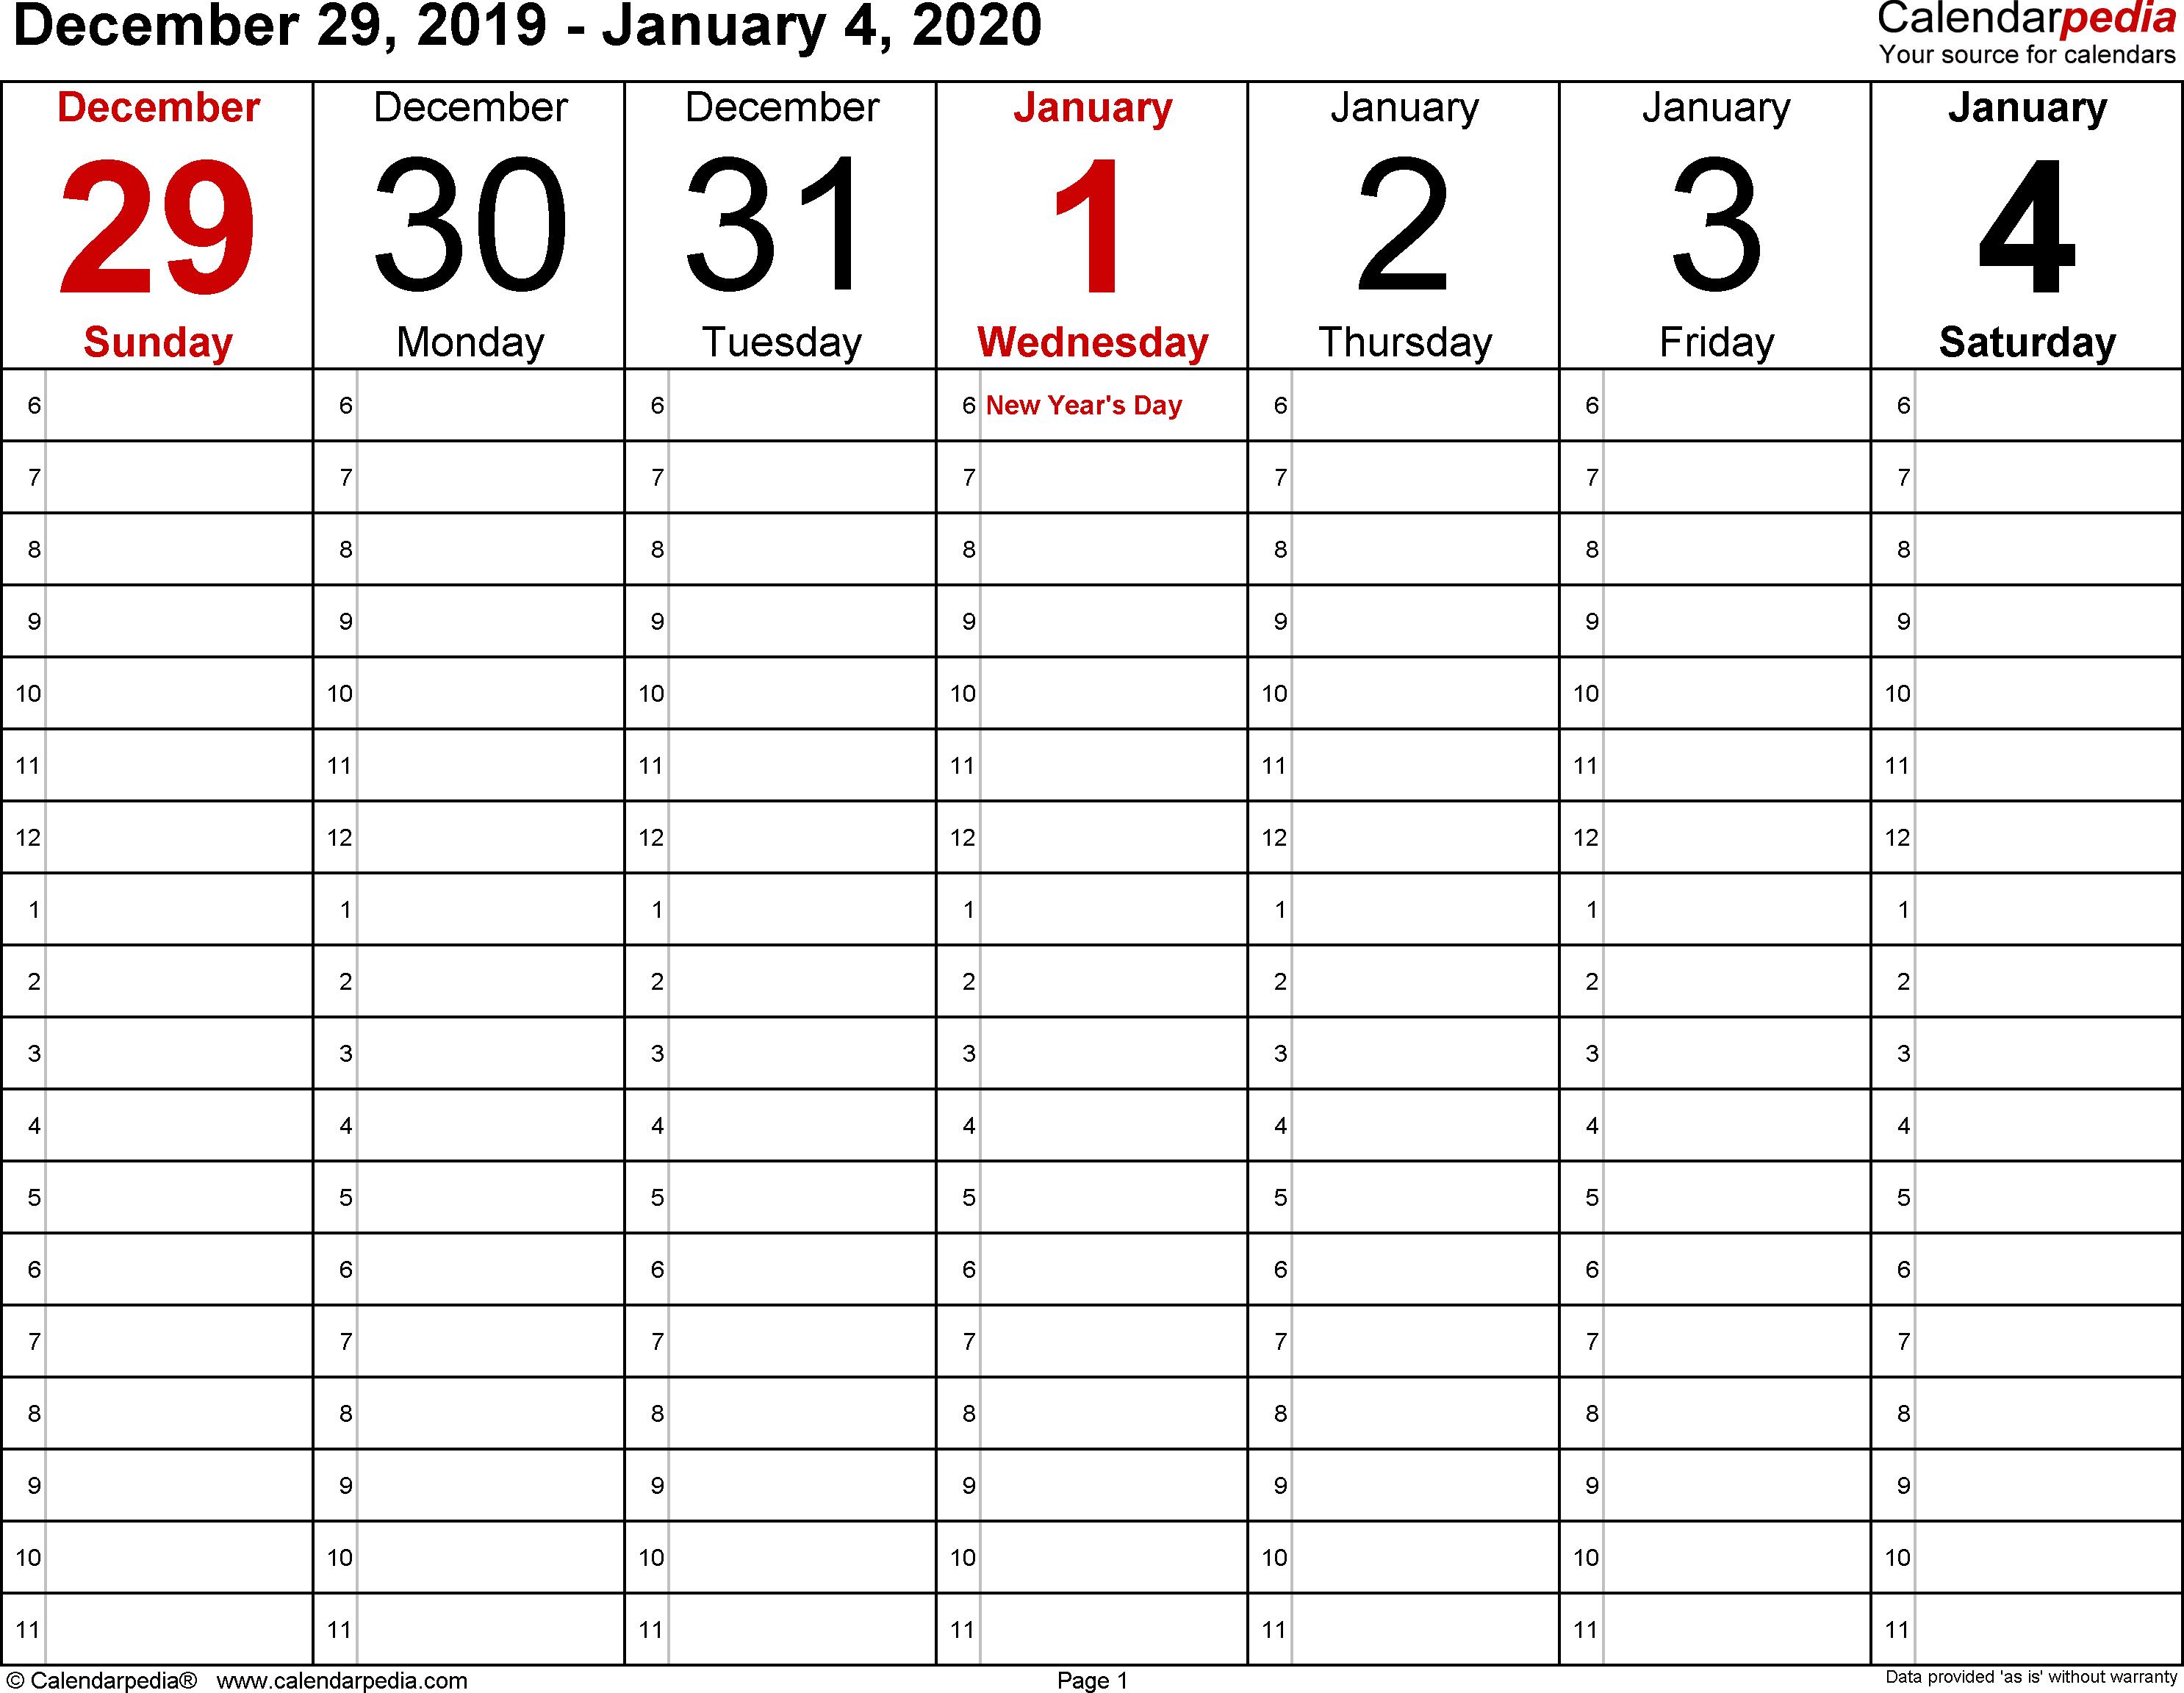 Weekly Calendar 2020 For Pdf - 12 Free Printable Templates